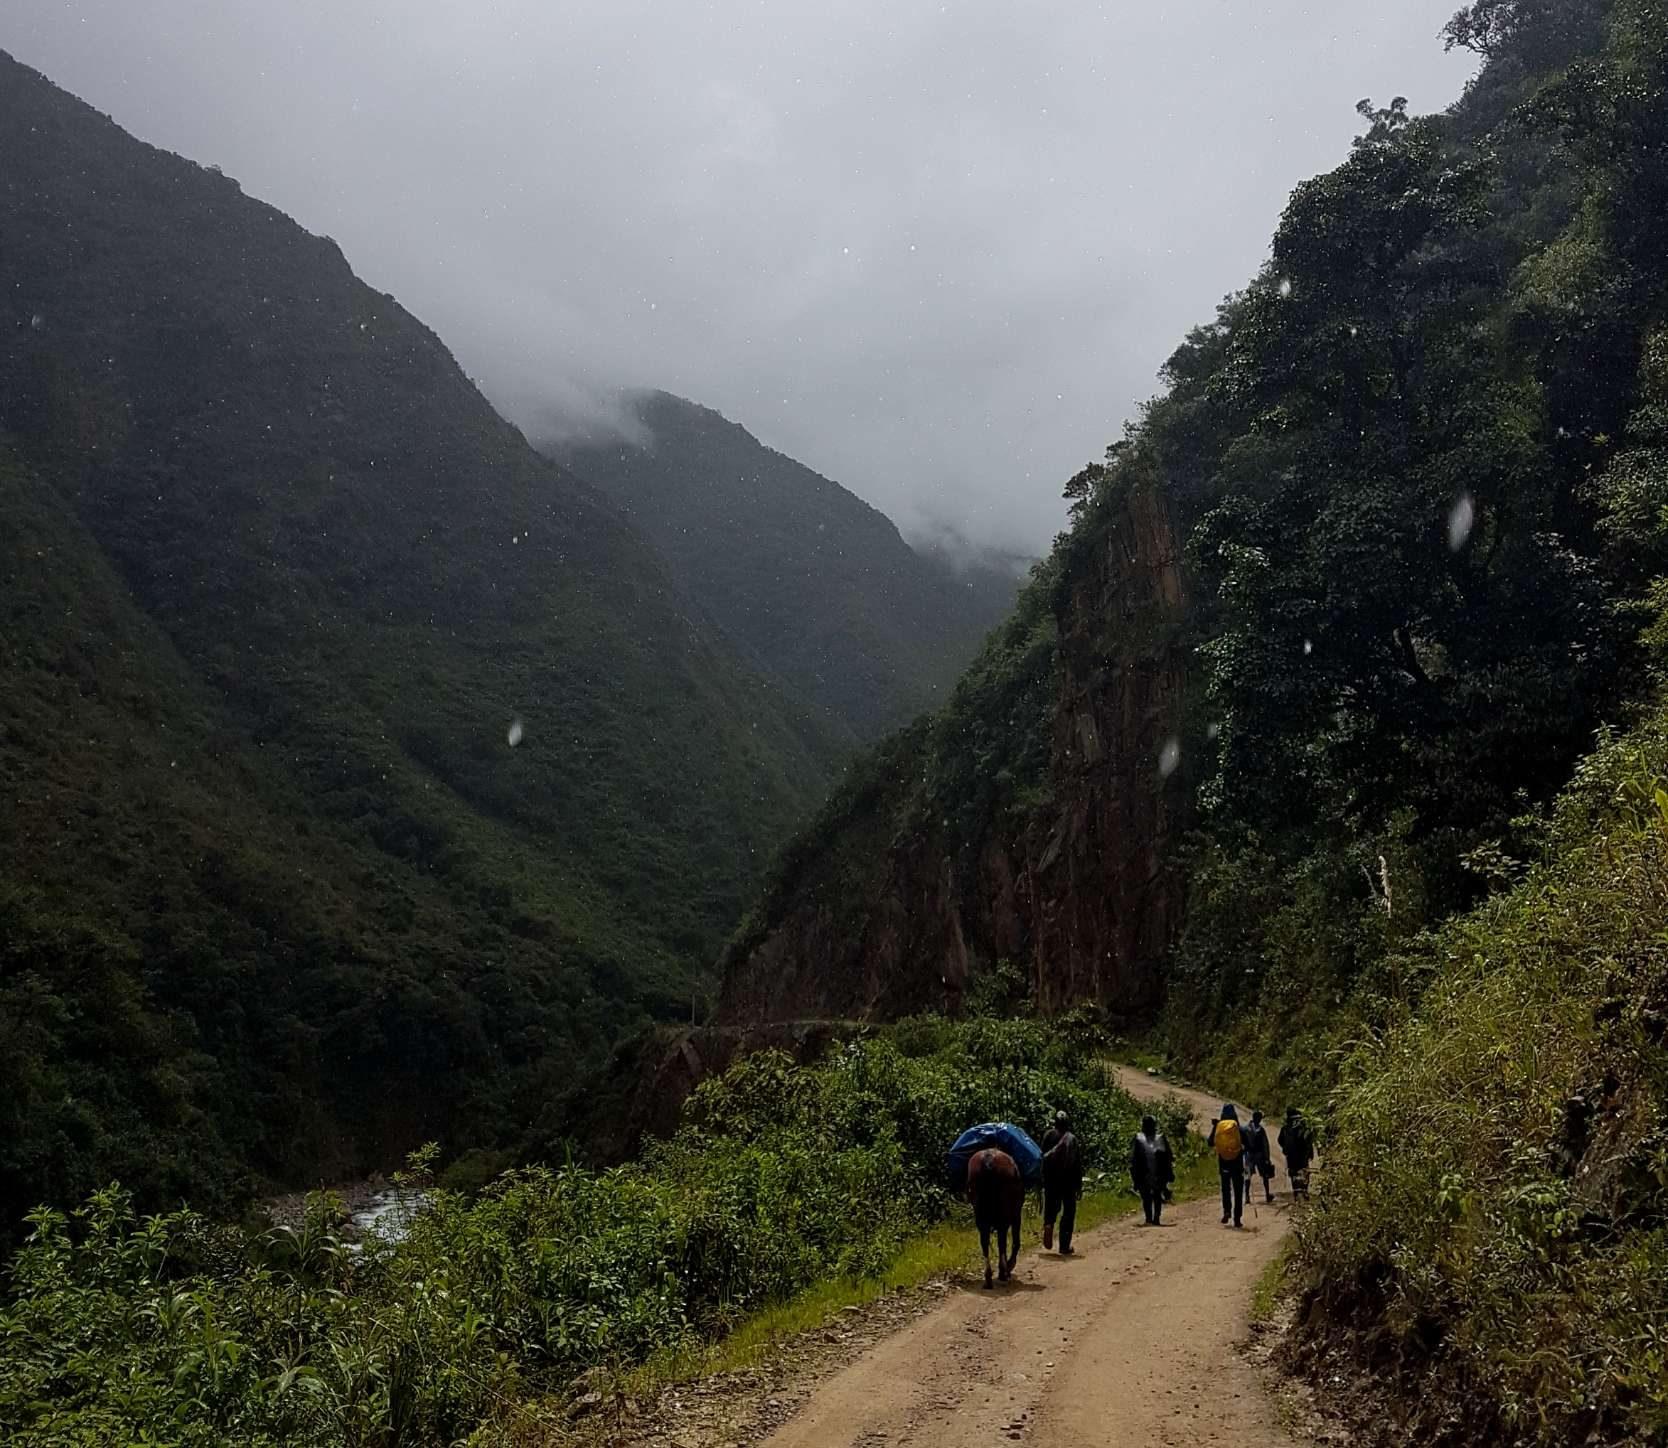 trekking-in-peru-salkantay-_-d-sanborn-2018